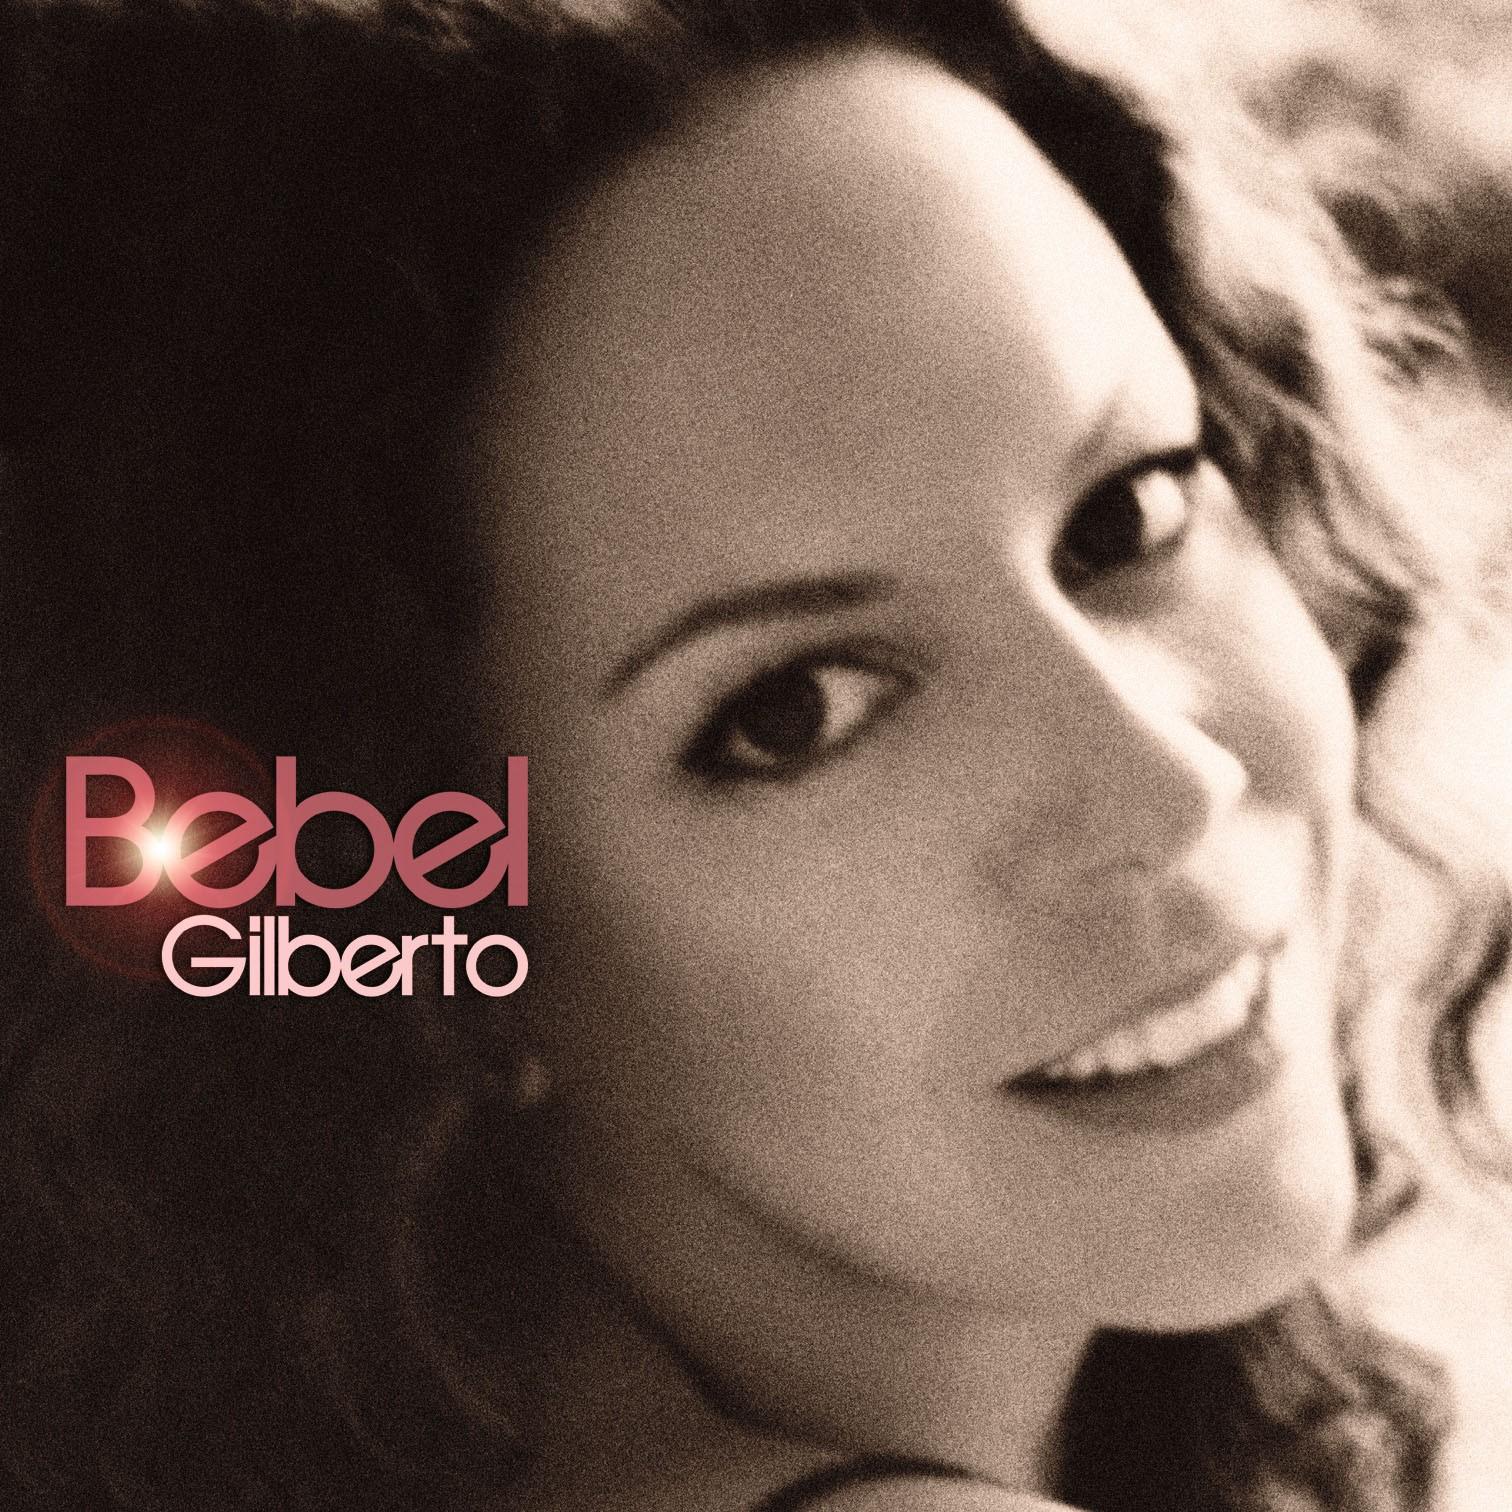 Bebel Gilberto net worth